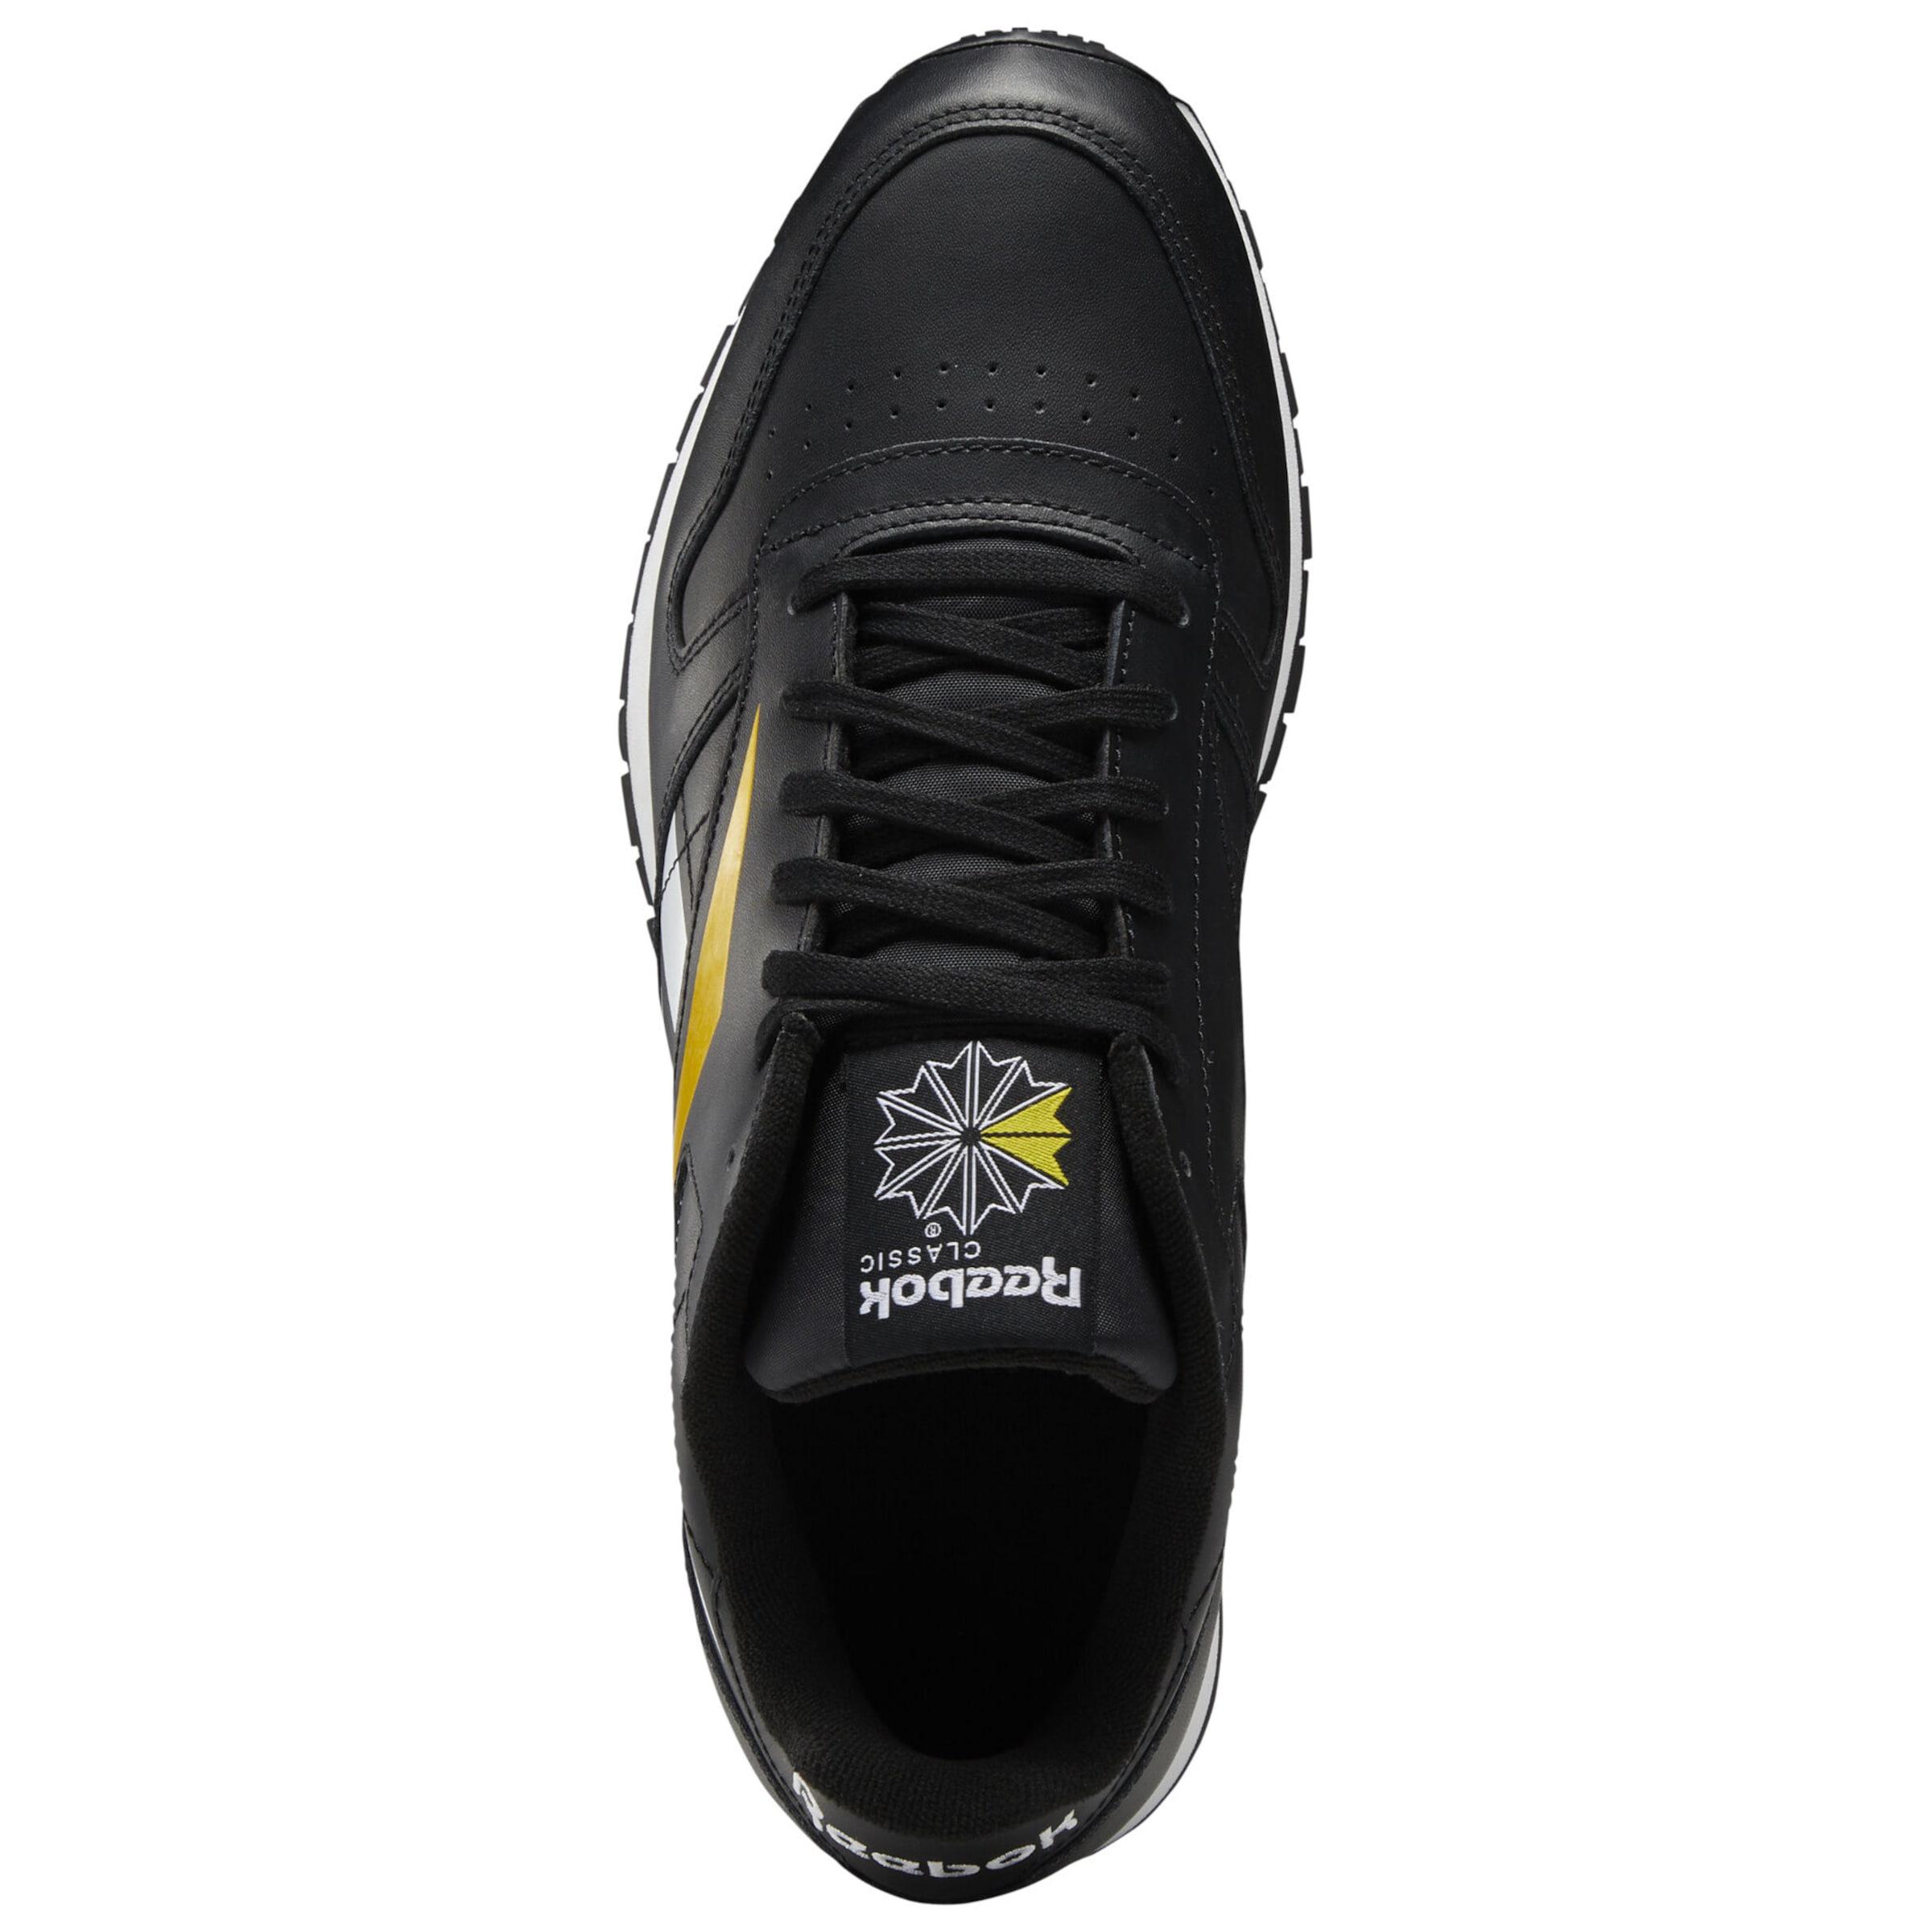 In Classic Reebok Sneaker Reebok GelbSchwarz Classic rxoWQedBC